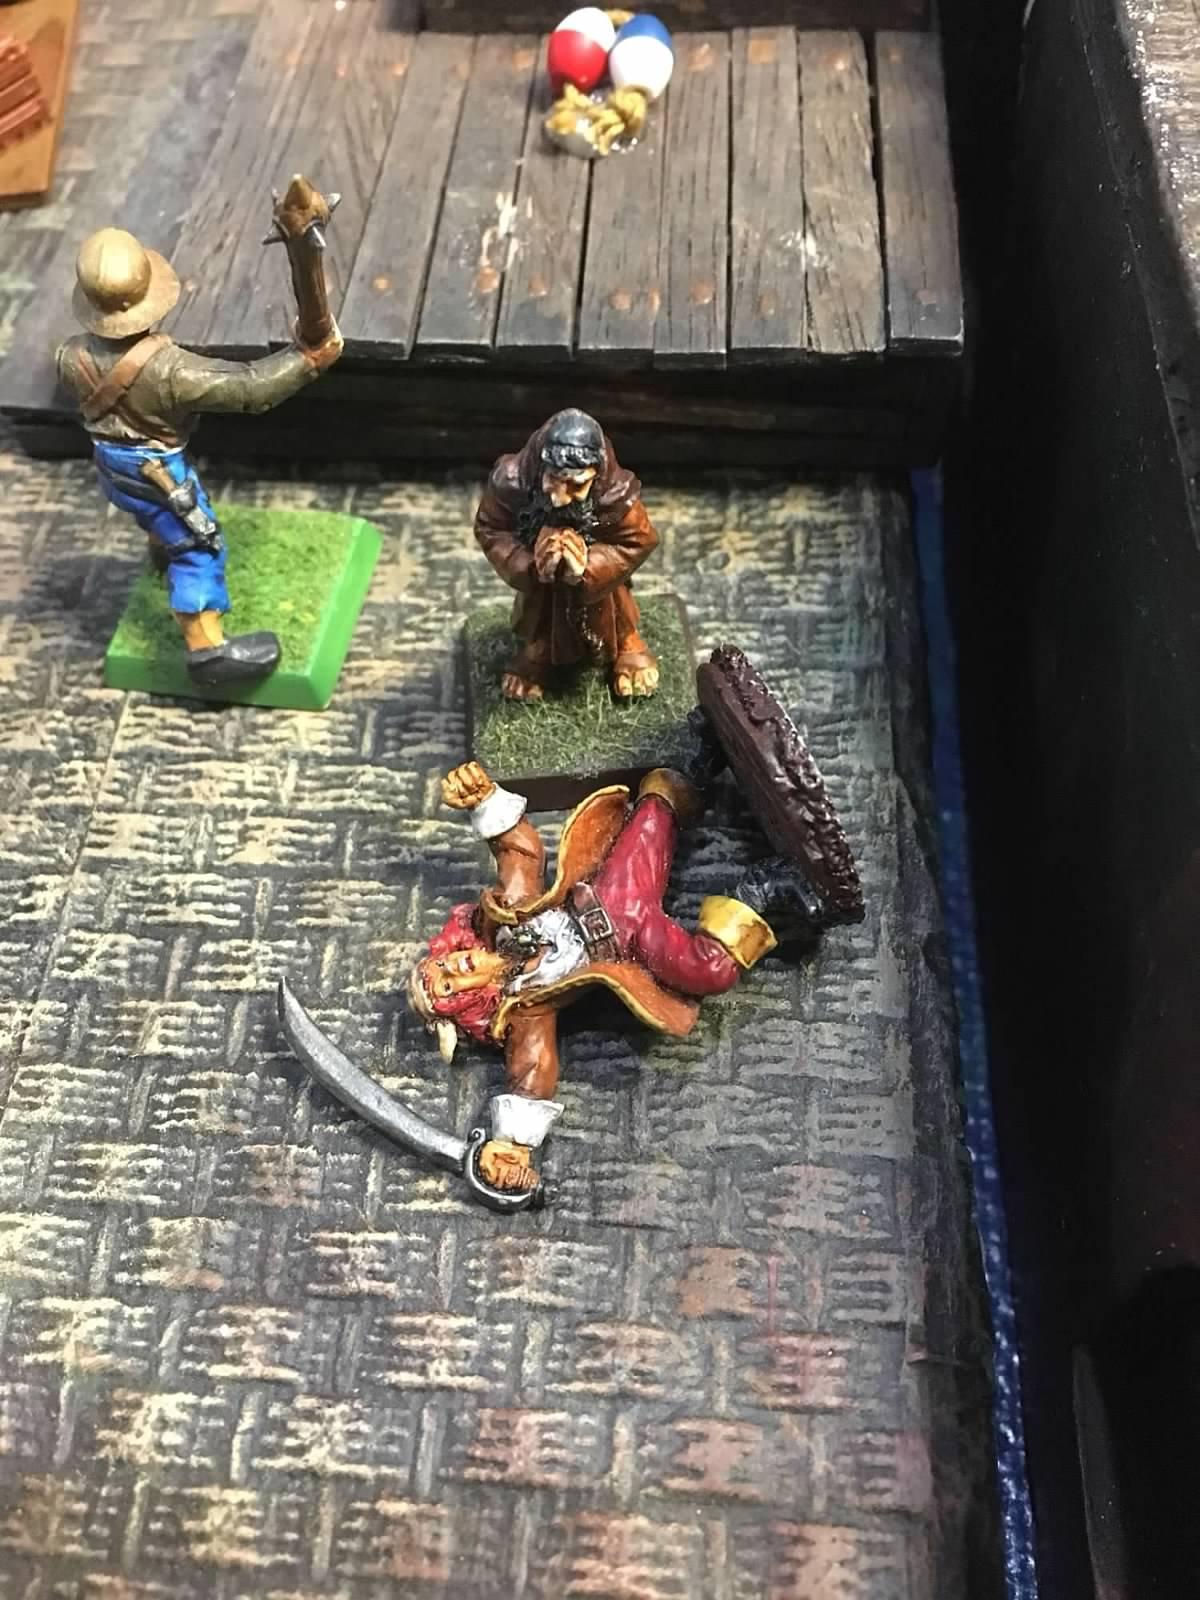 Pyrates of the Karribean VI.a--Dead Man's Hand - Page 3 47a8dd29b3127cce985499196e4a00000010100AbOXDRkzbMmWA